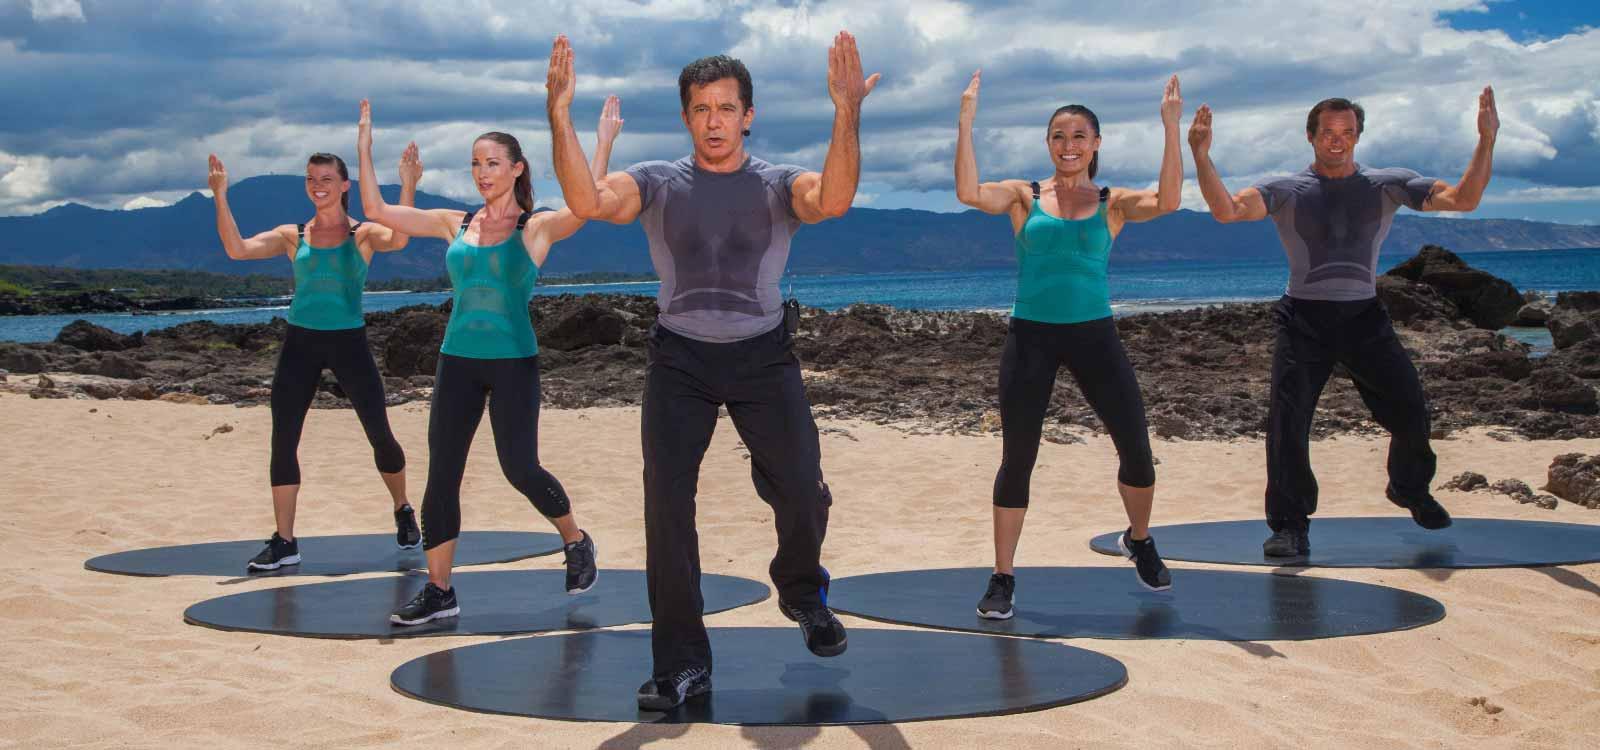 Arnold schwarzenegger how to loss fat